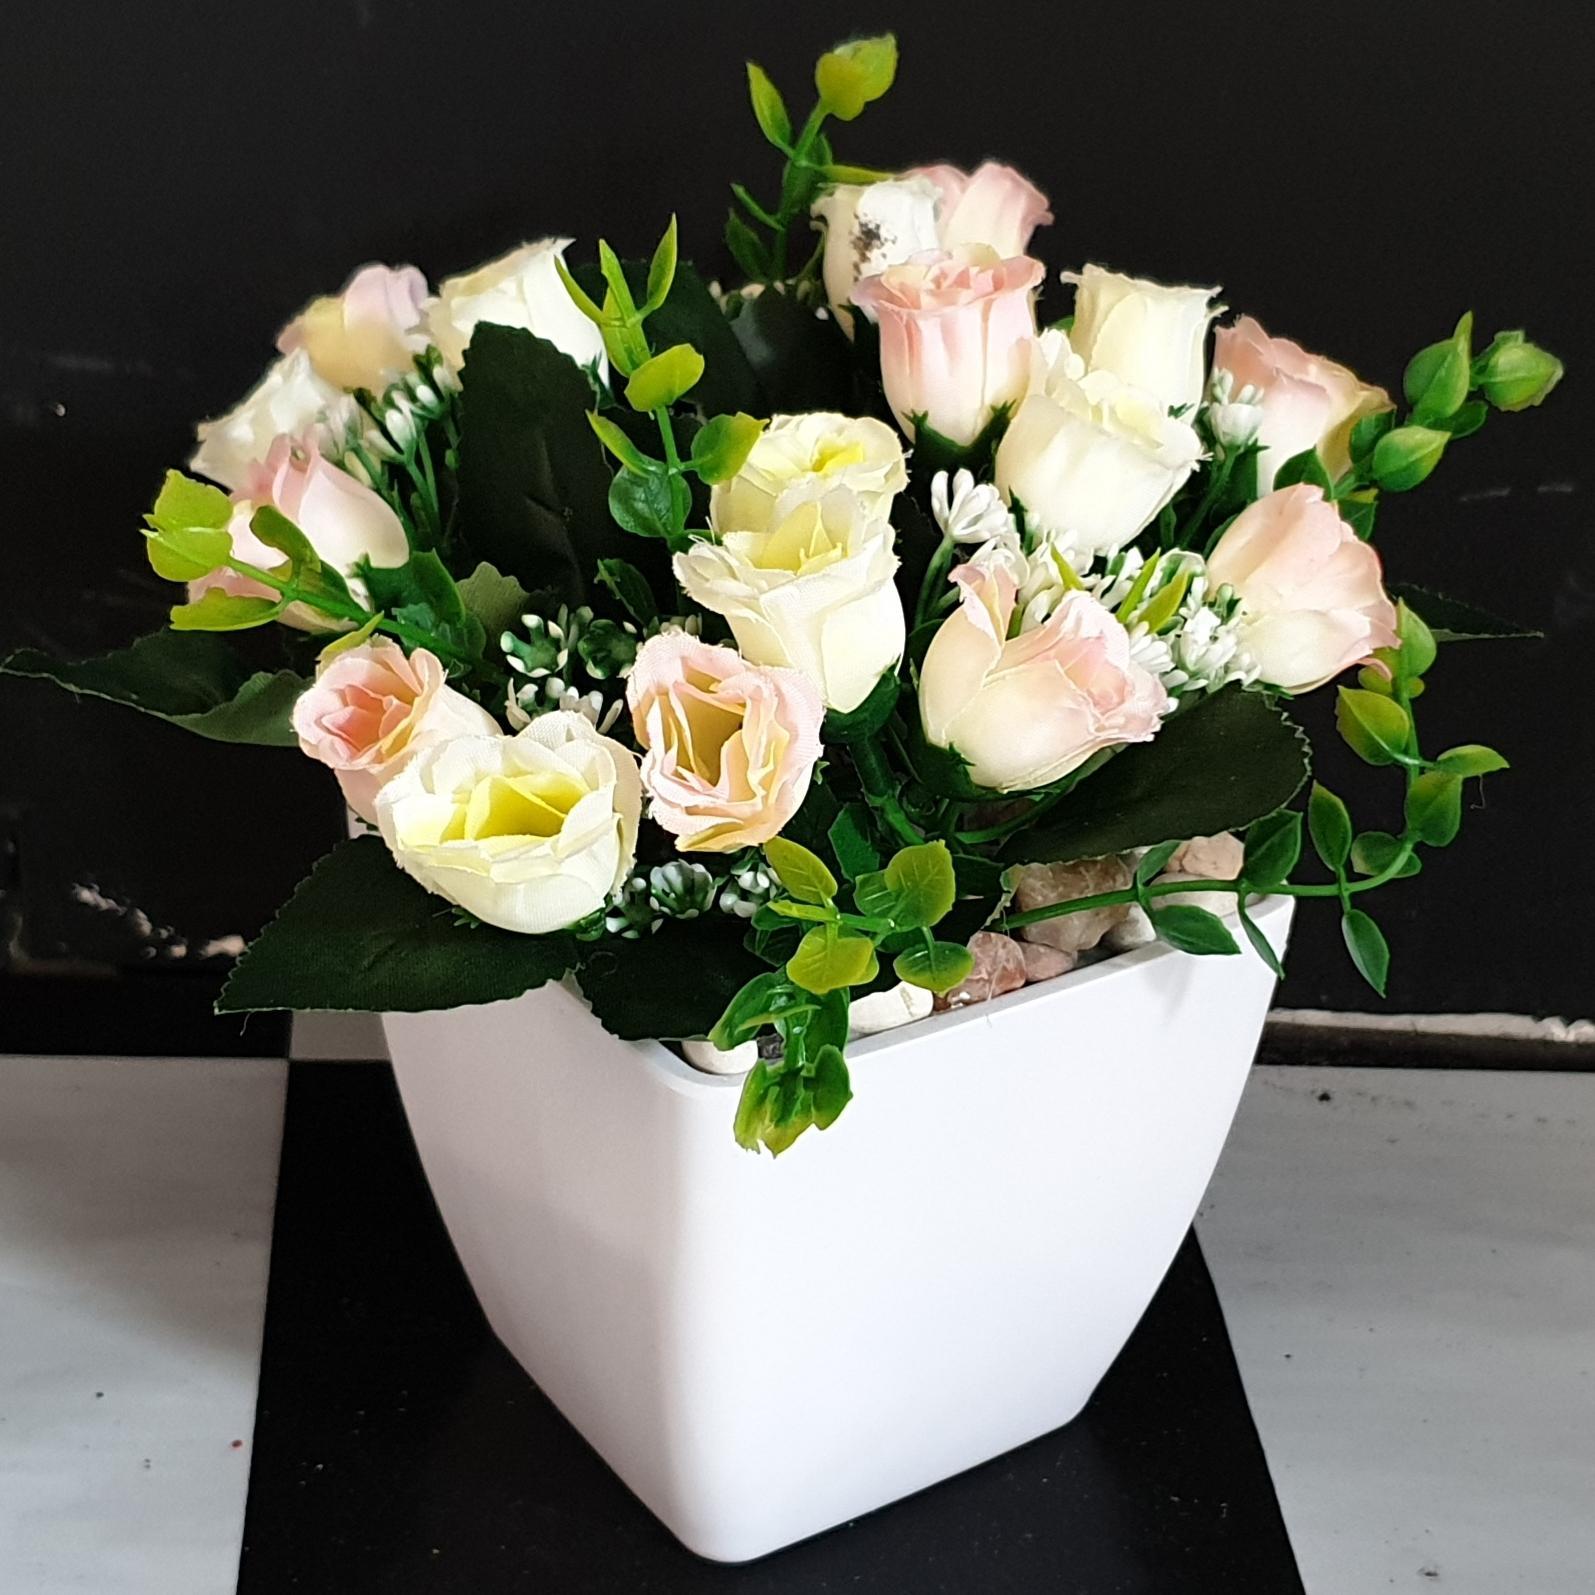 Bunga Mawar Terbaru - Bunga Pajangan - Bunga Hias Plastik - Tanaman  artifisial Pot Plastik FV188A 24fb9d0764